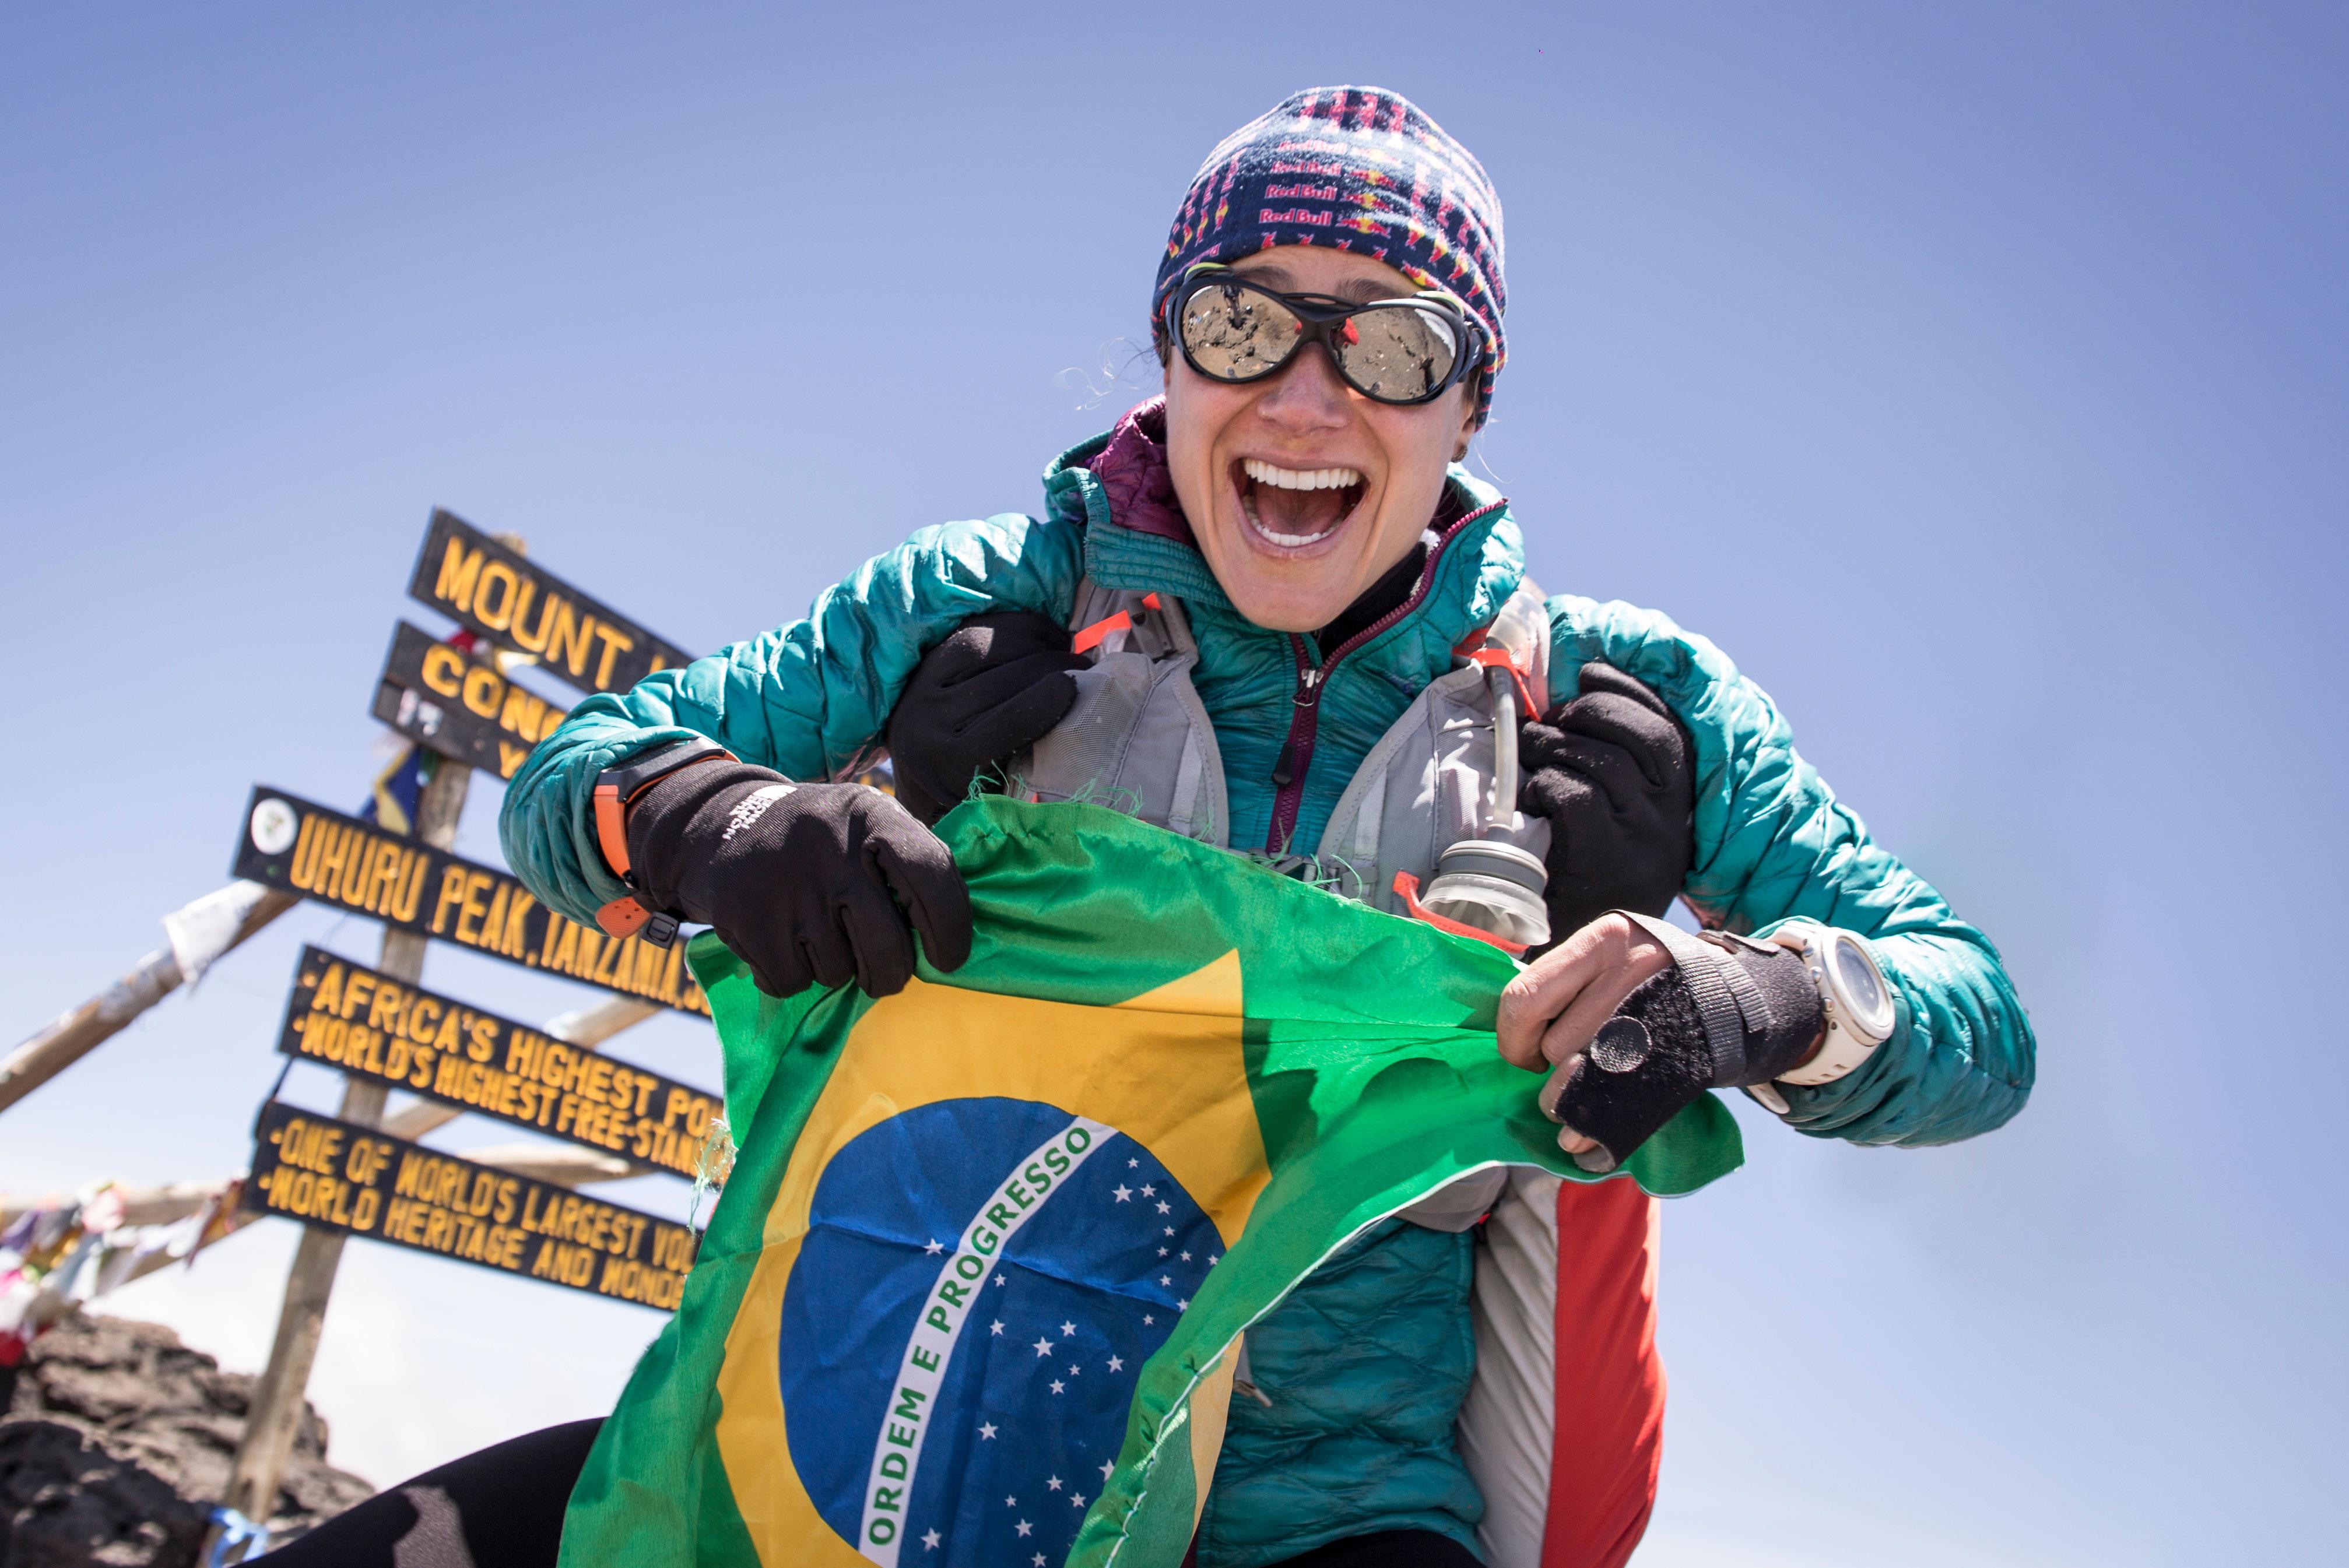 kilimanjaro-womens-fkt-flag-summit-fernanda